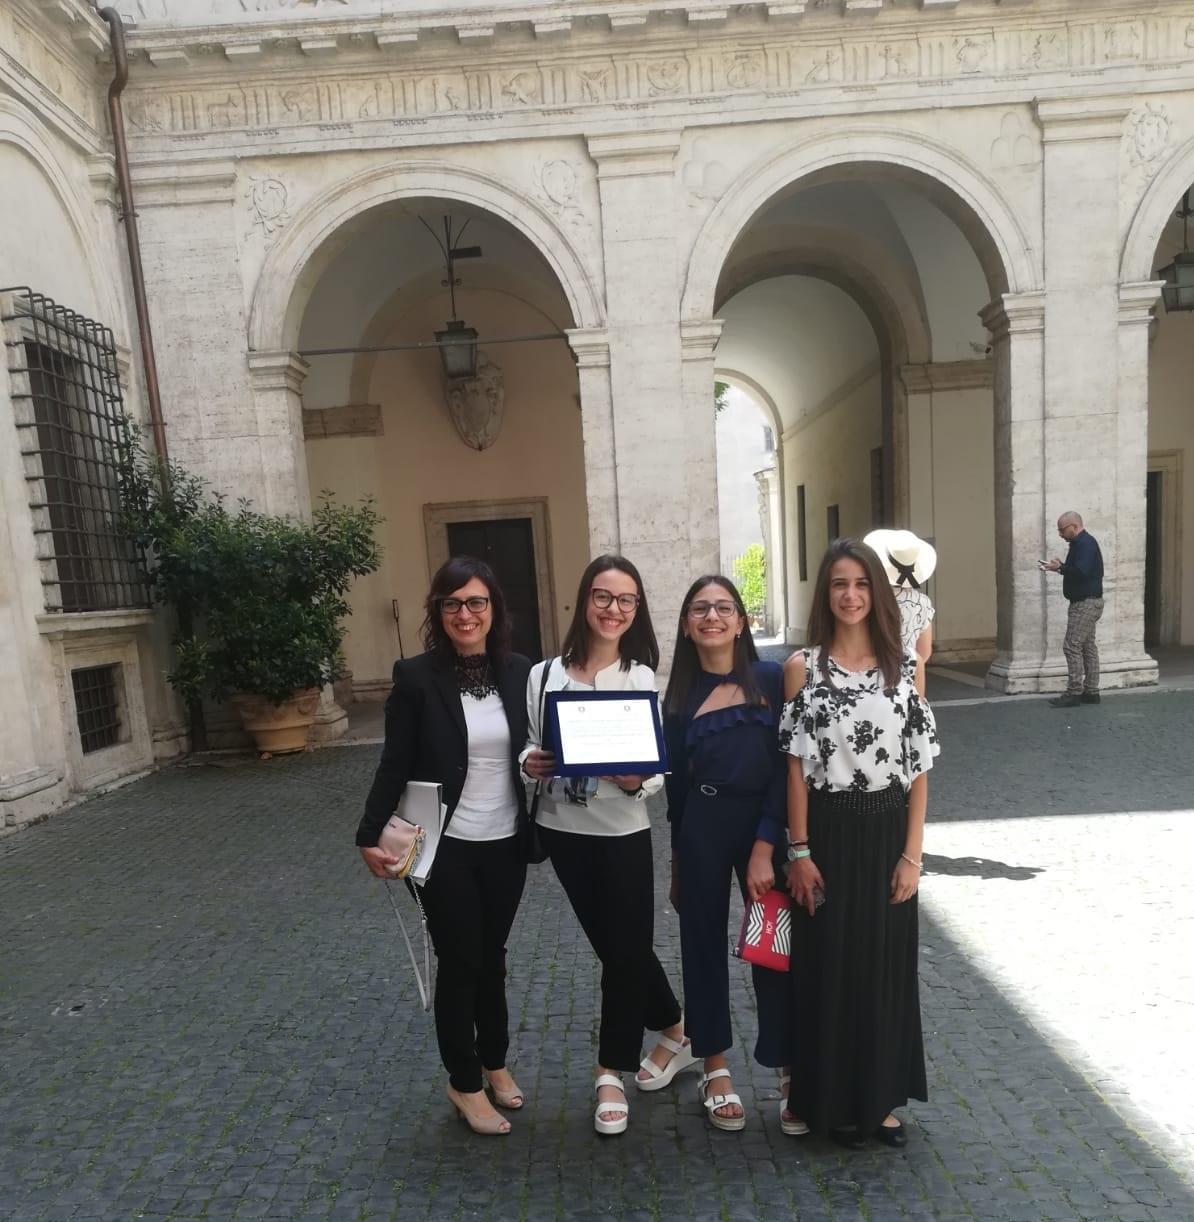 Le alunne premiate a Roma